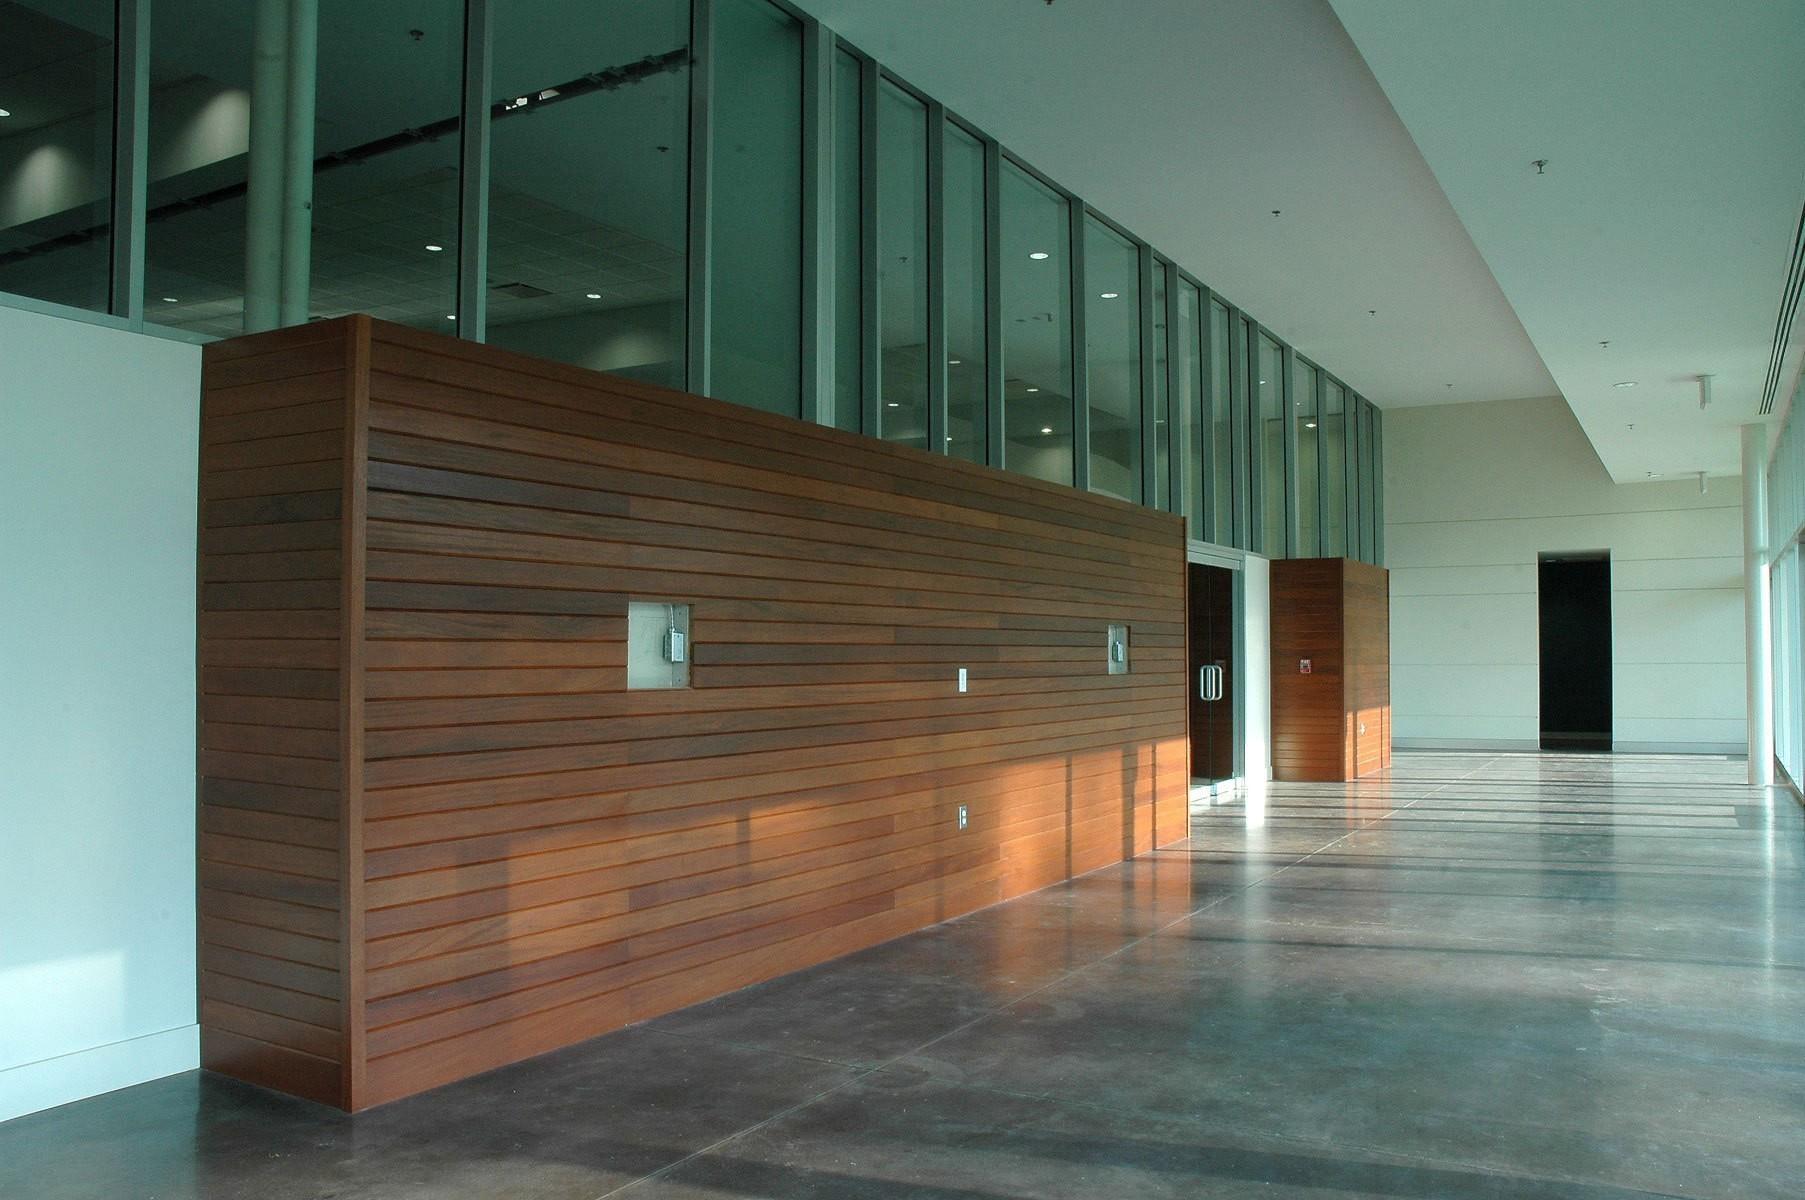 kia-training-center-interior-entrance